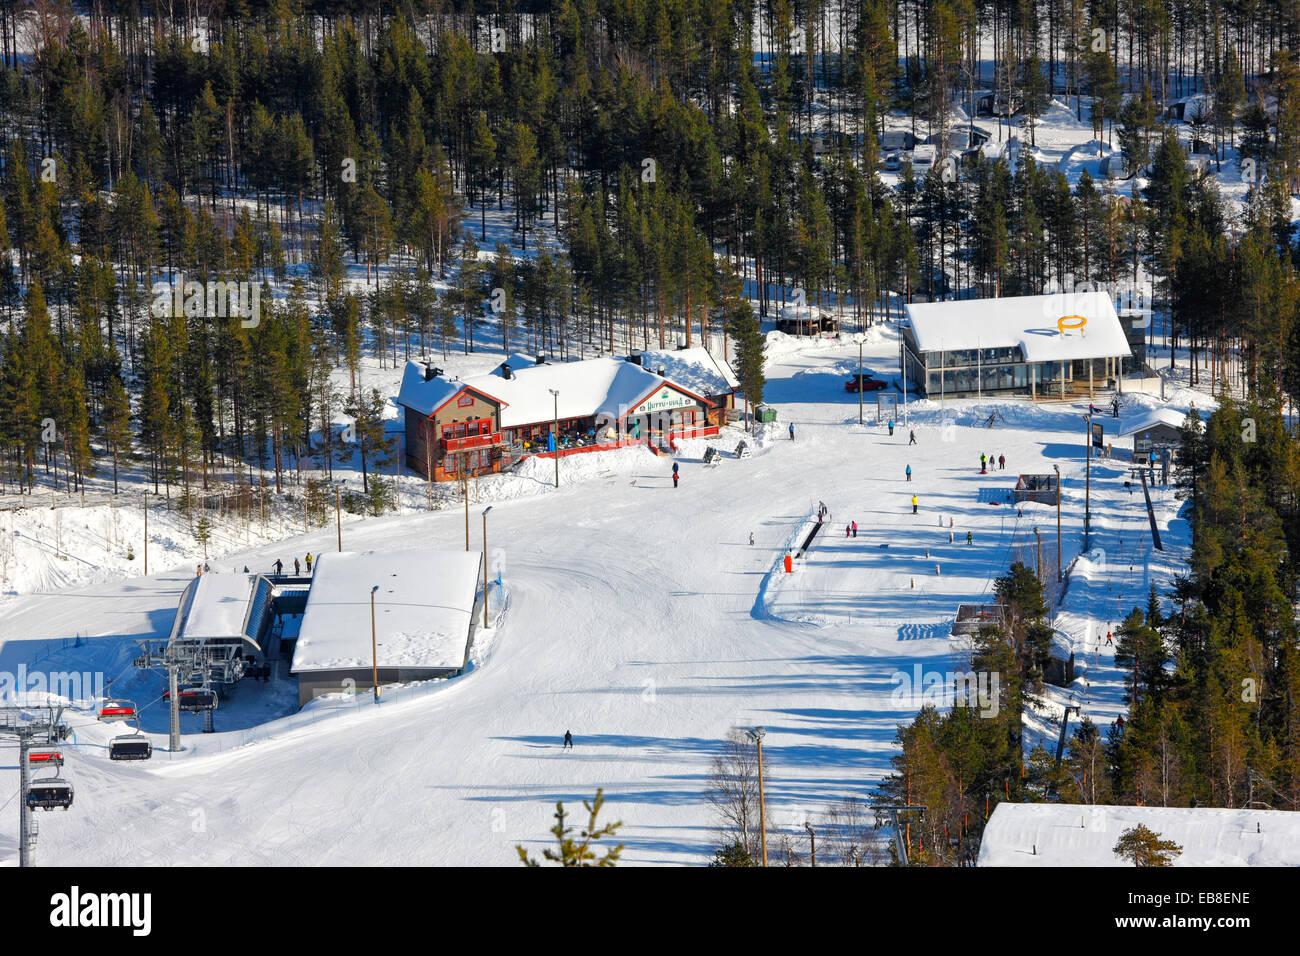 Finland ski center Pyhä, Lapland - Stock Image